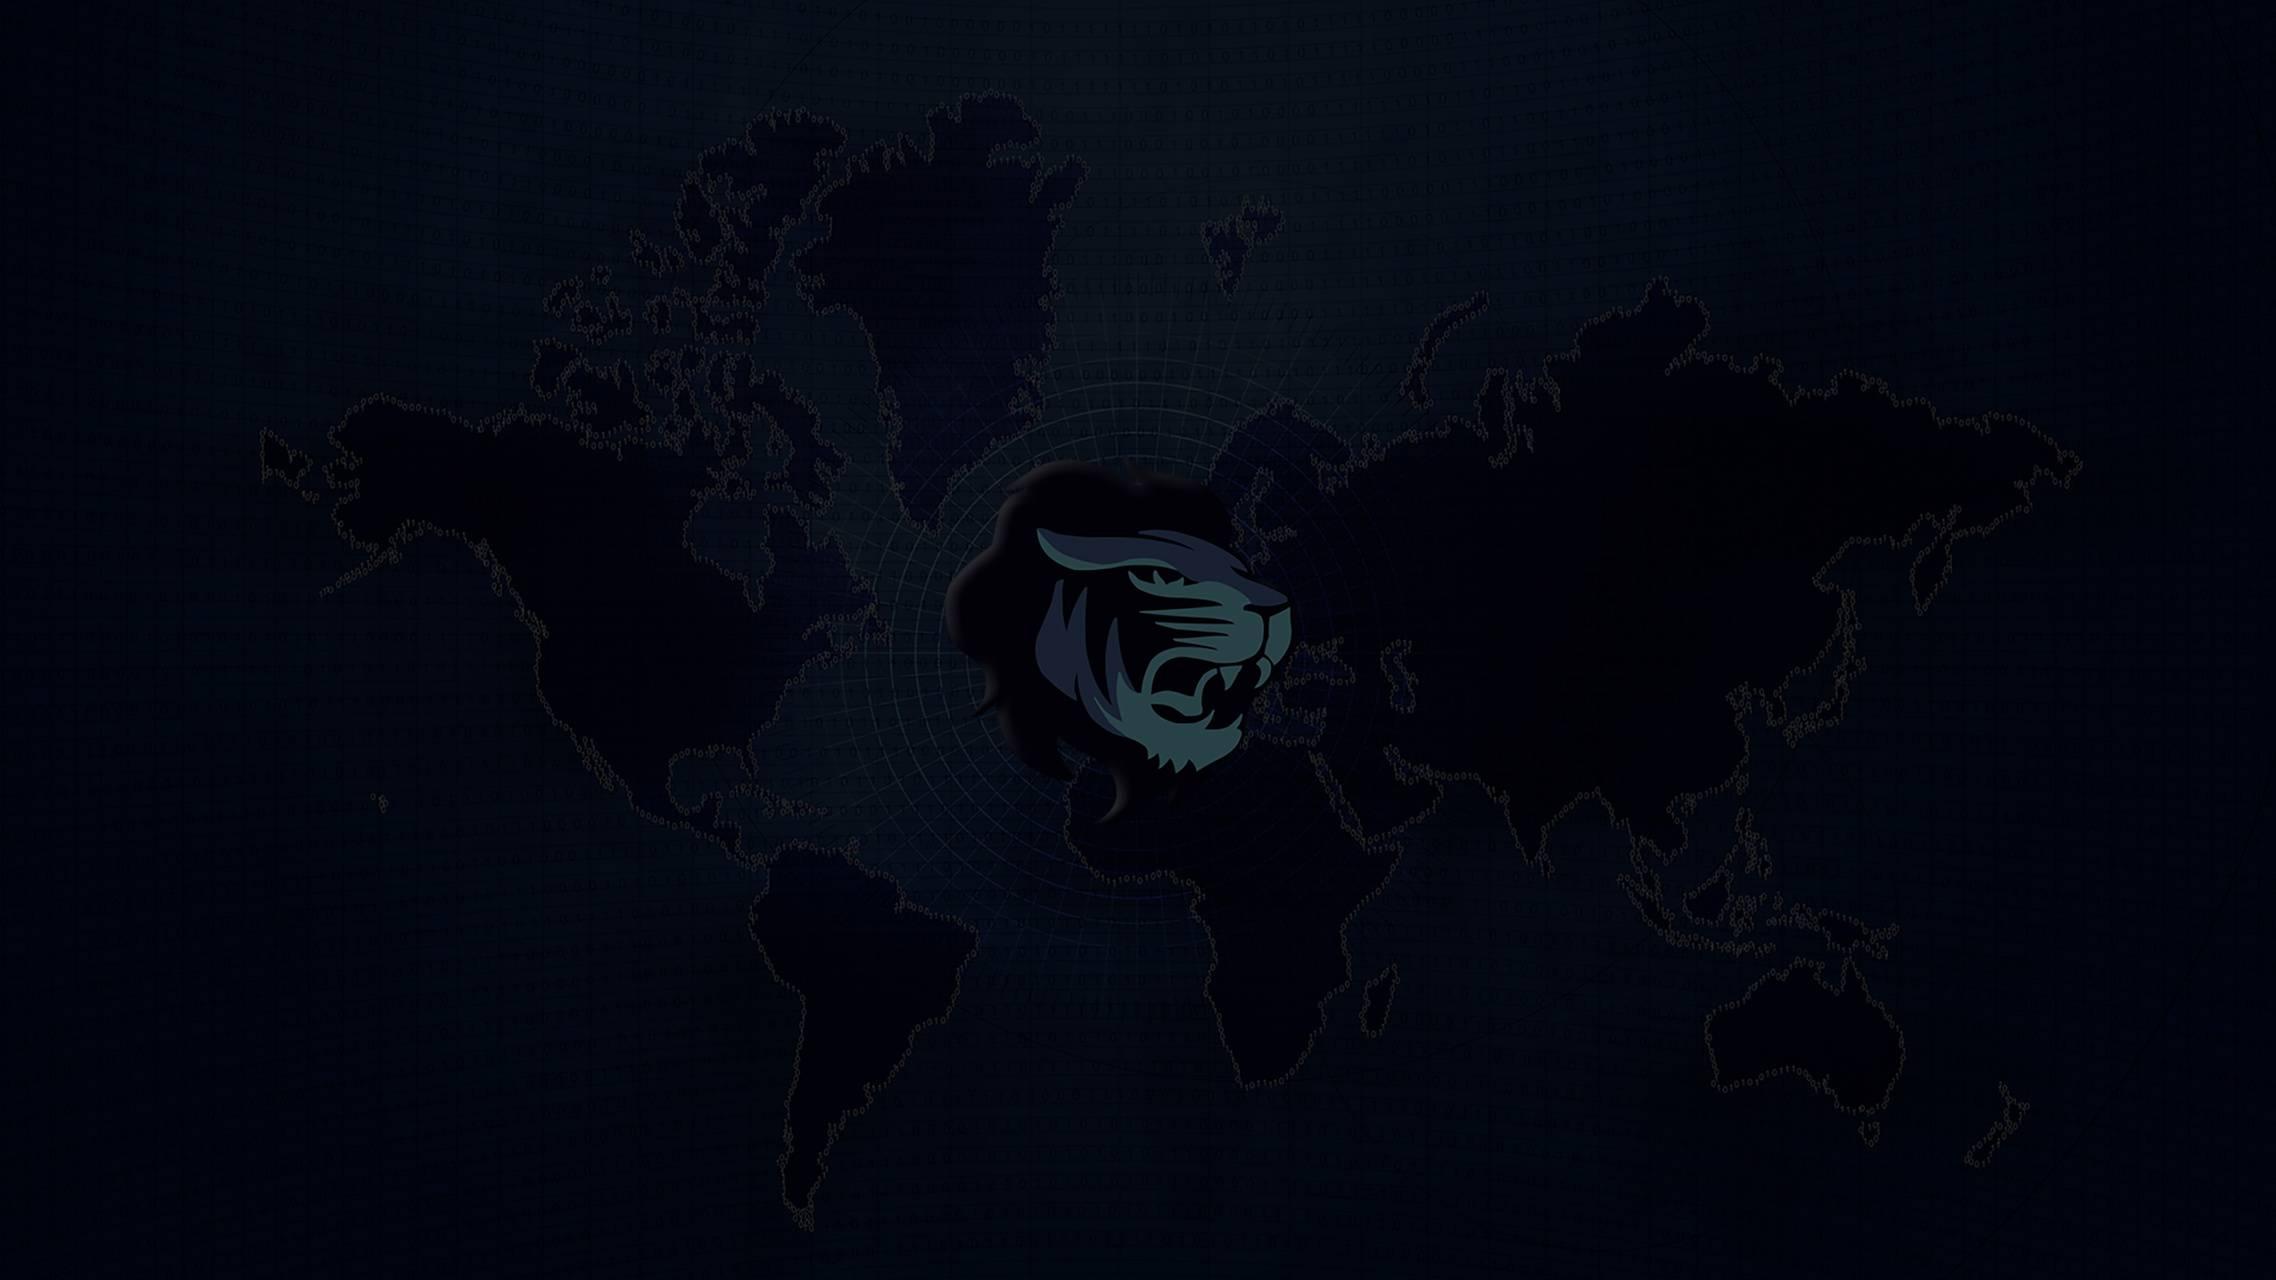 Lion Network